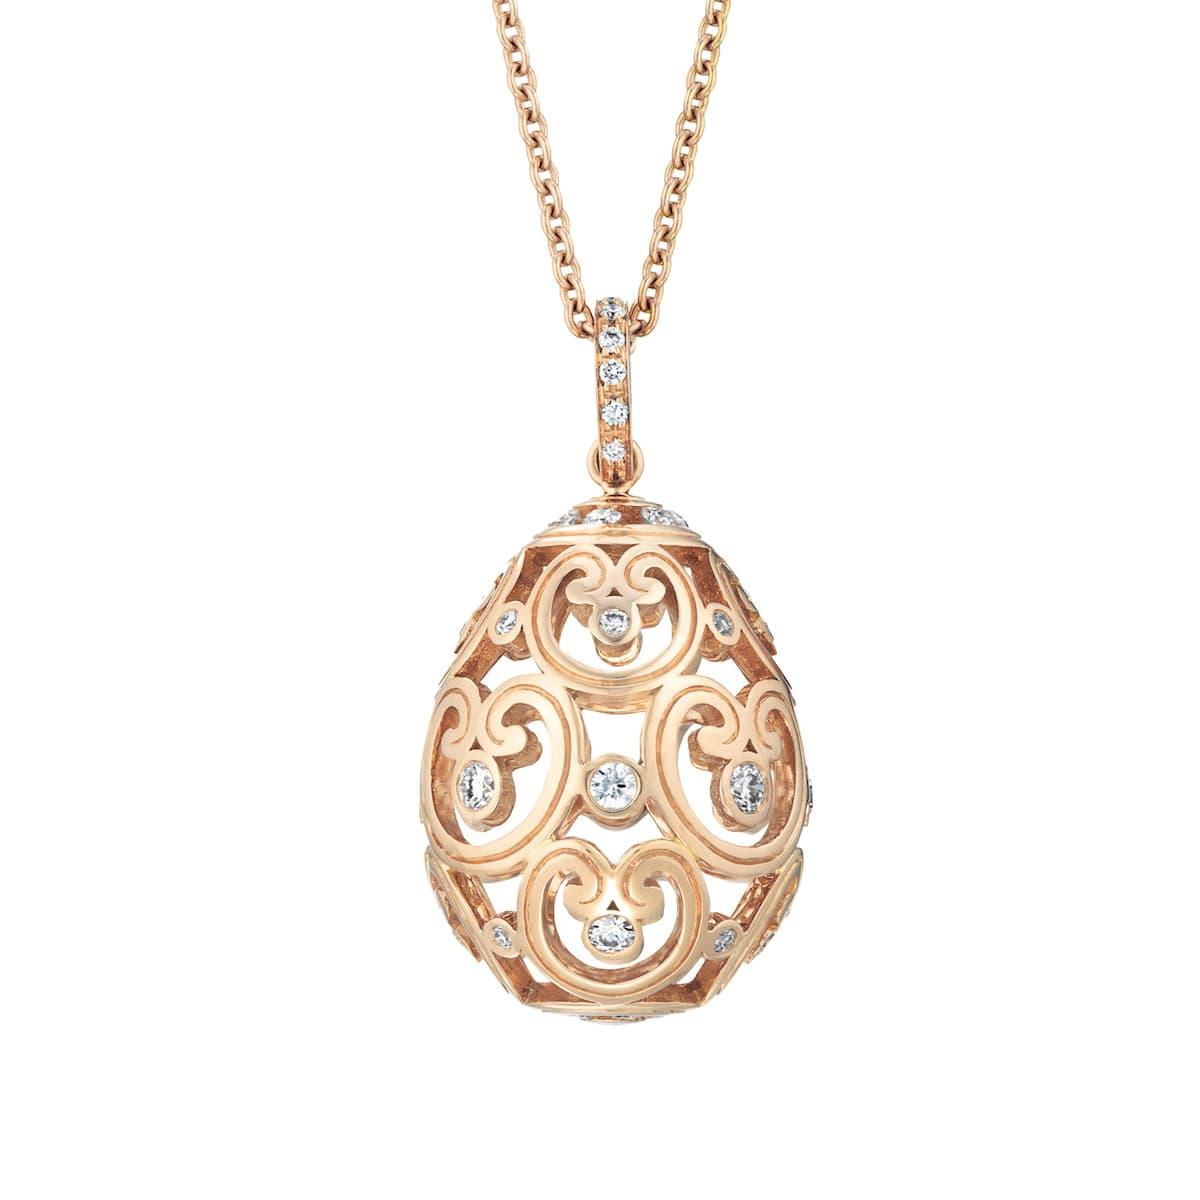 P-7-Impératrice-Diamond-Rose-Gold-Pendant-Kopie